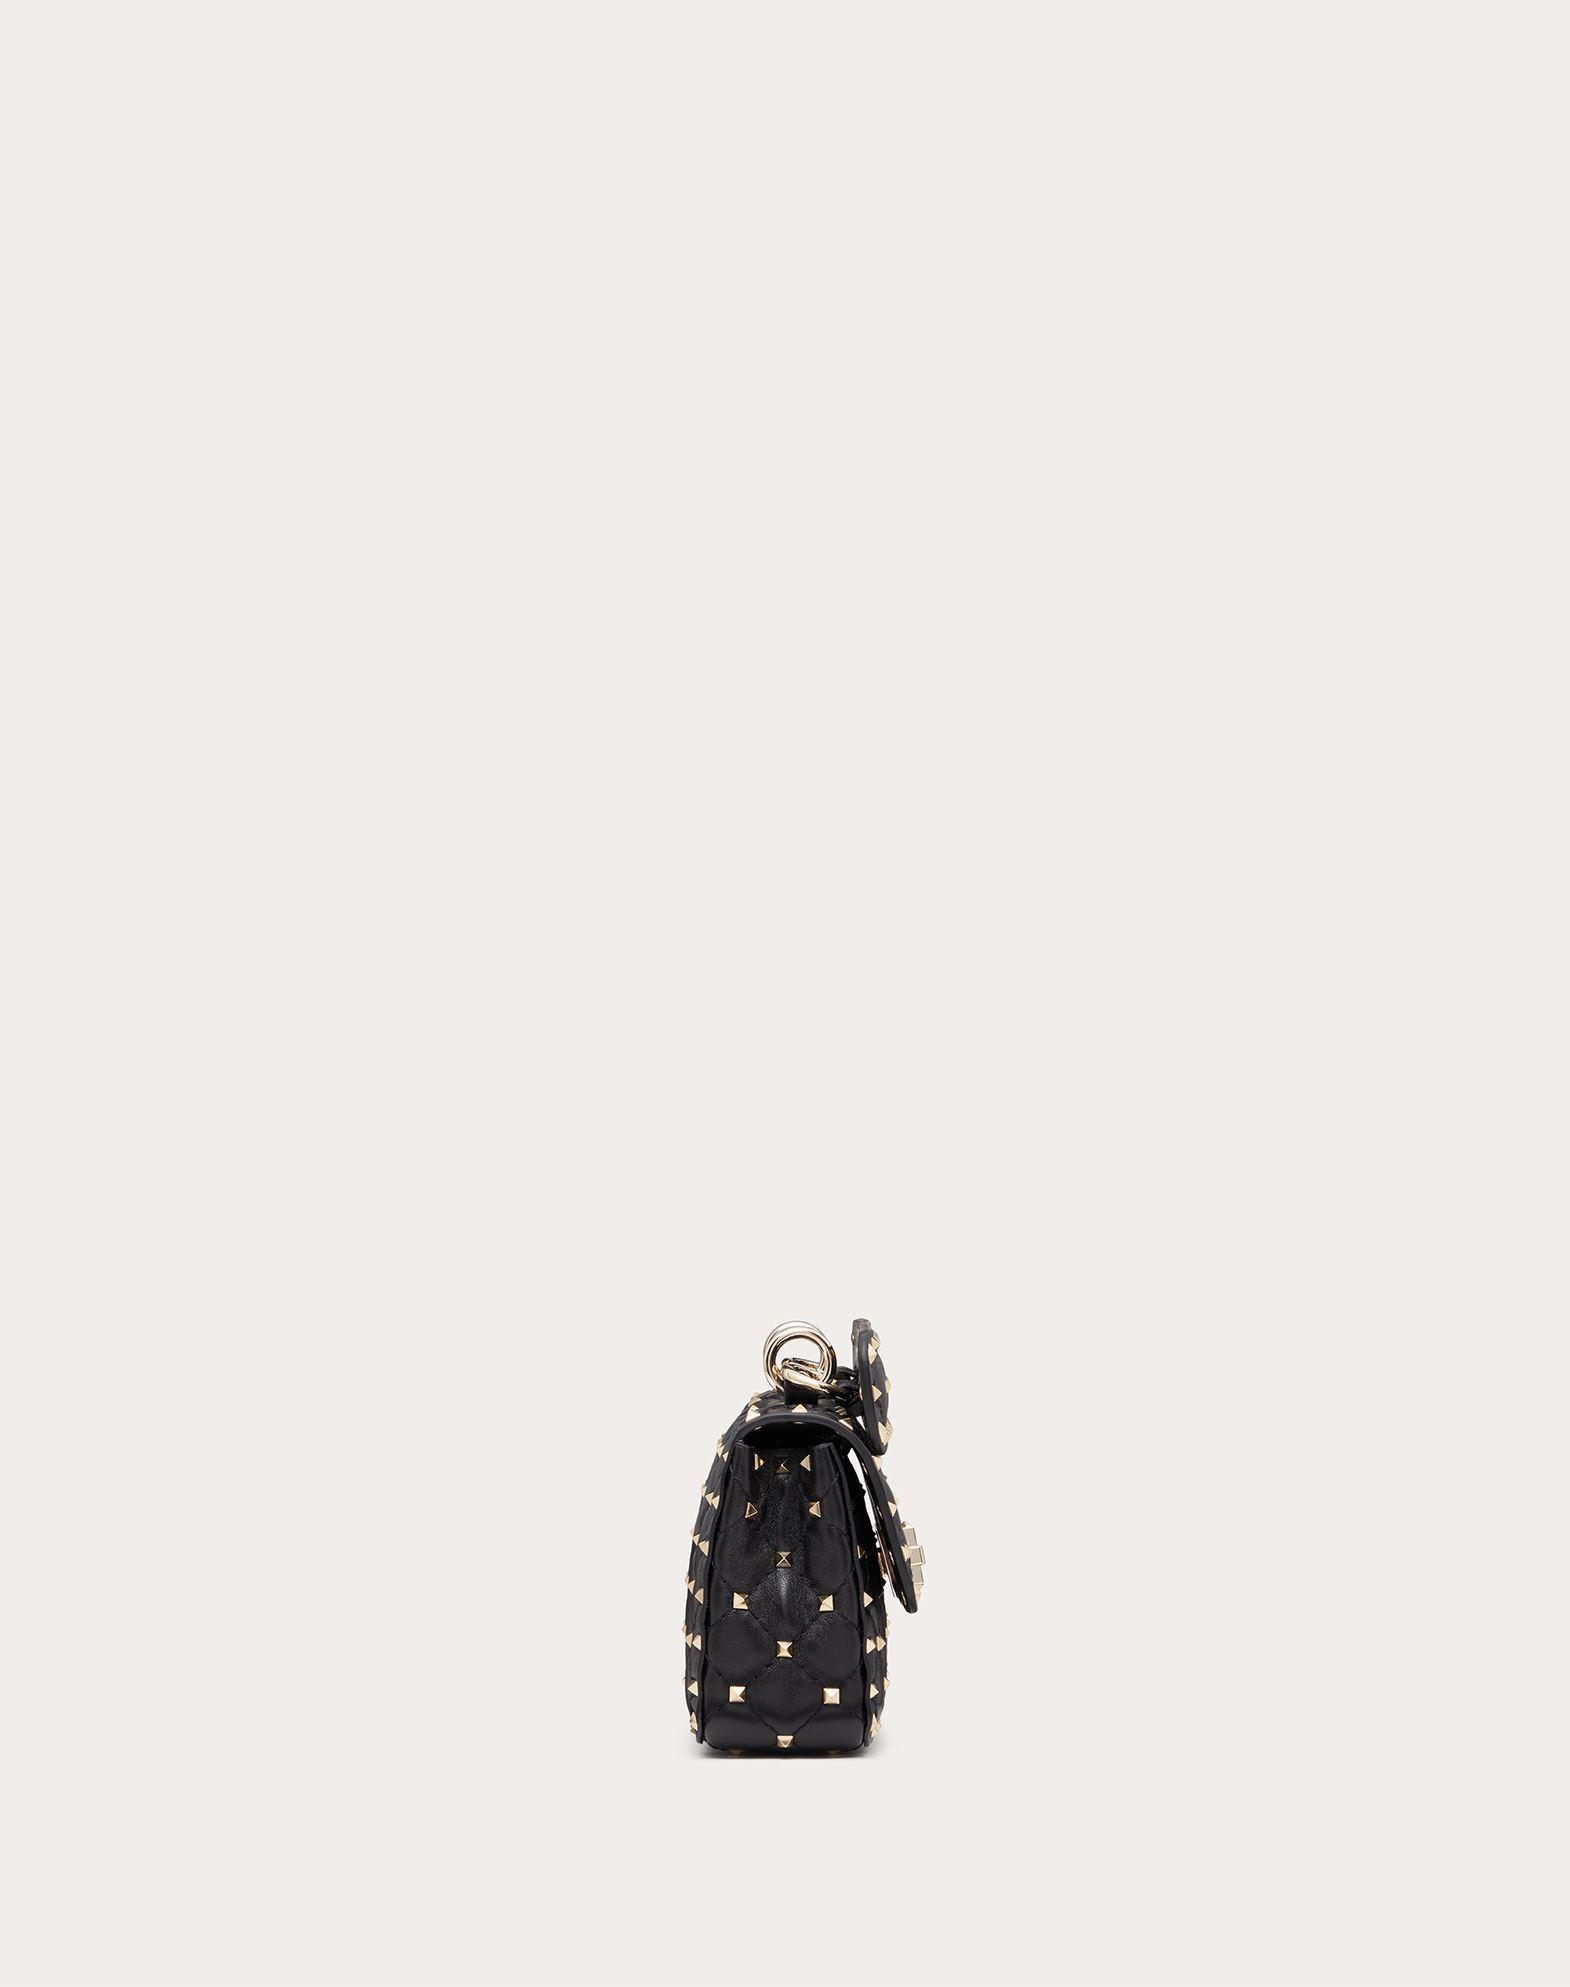 VALENTINO GARAVANI Rockstud Spike Small Chain Bag Shoulder bag D a